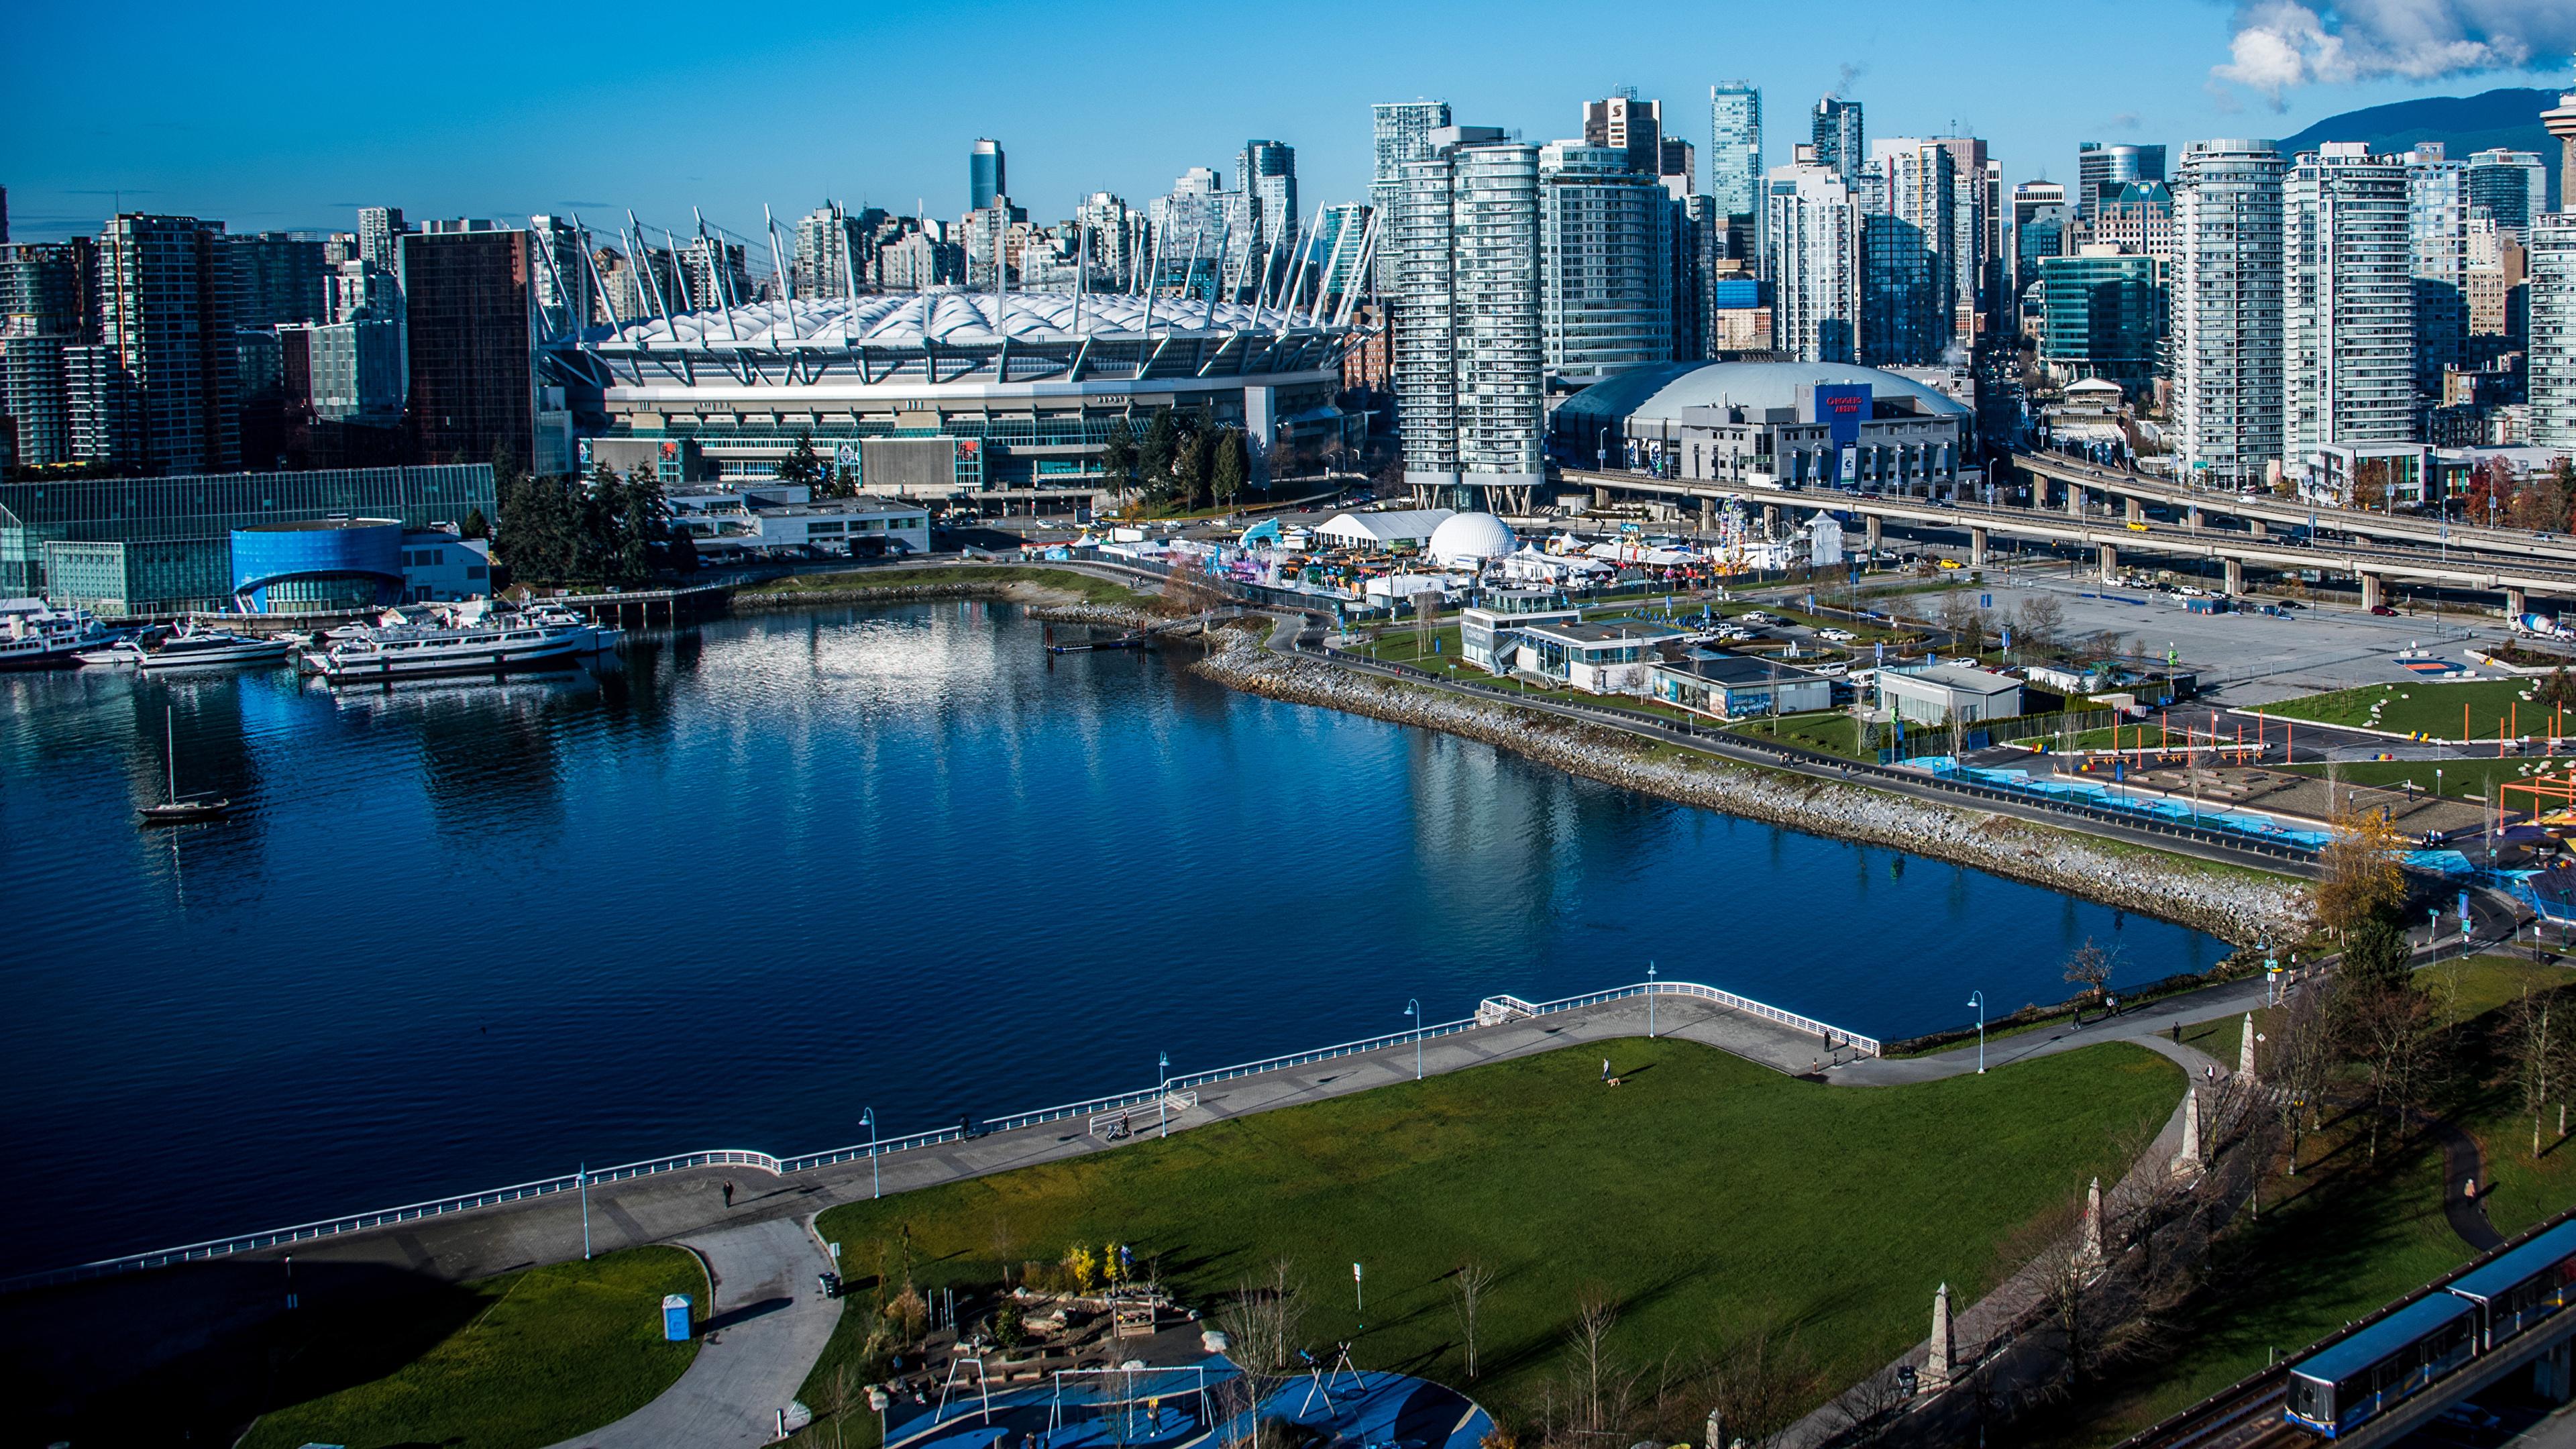 Фото Ванкувер Канада Залив Причалы город Здания 3840x2160 Пирсы залива заливы Пристань Дома Города